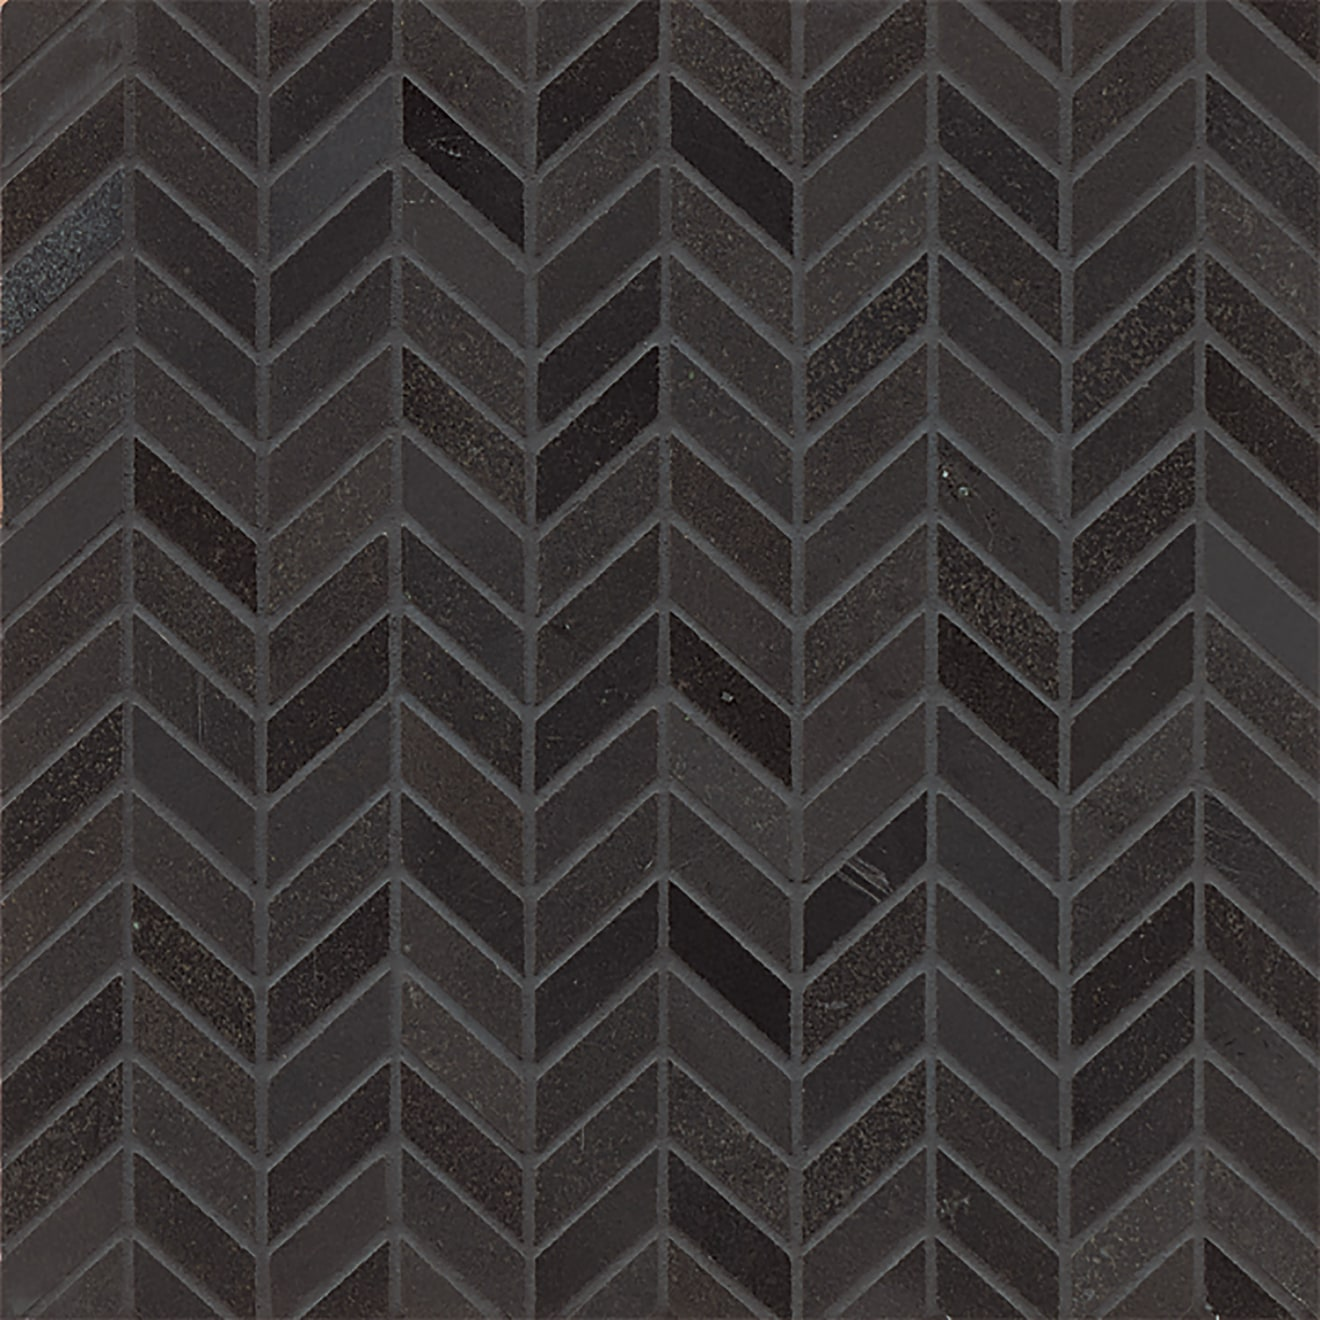 Absolute Black Chevron Polished Granite Mosaic Tile